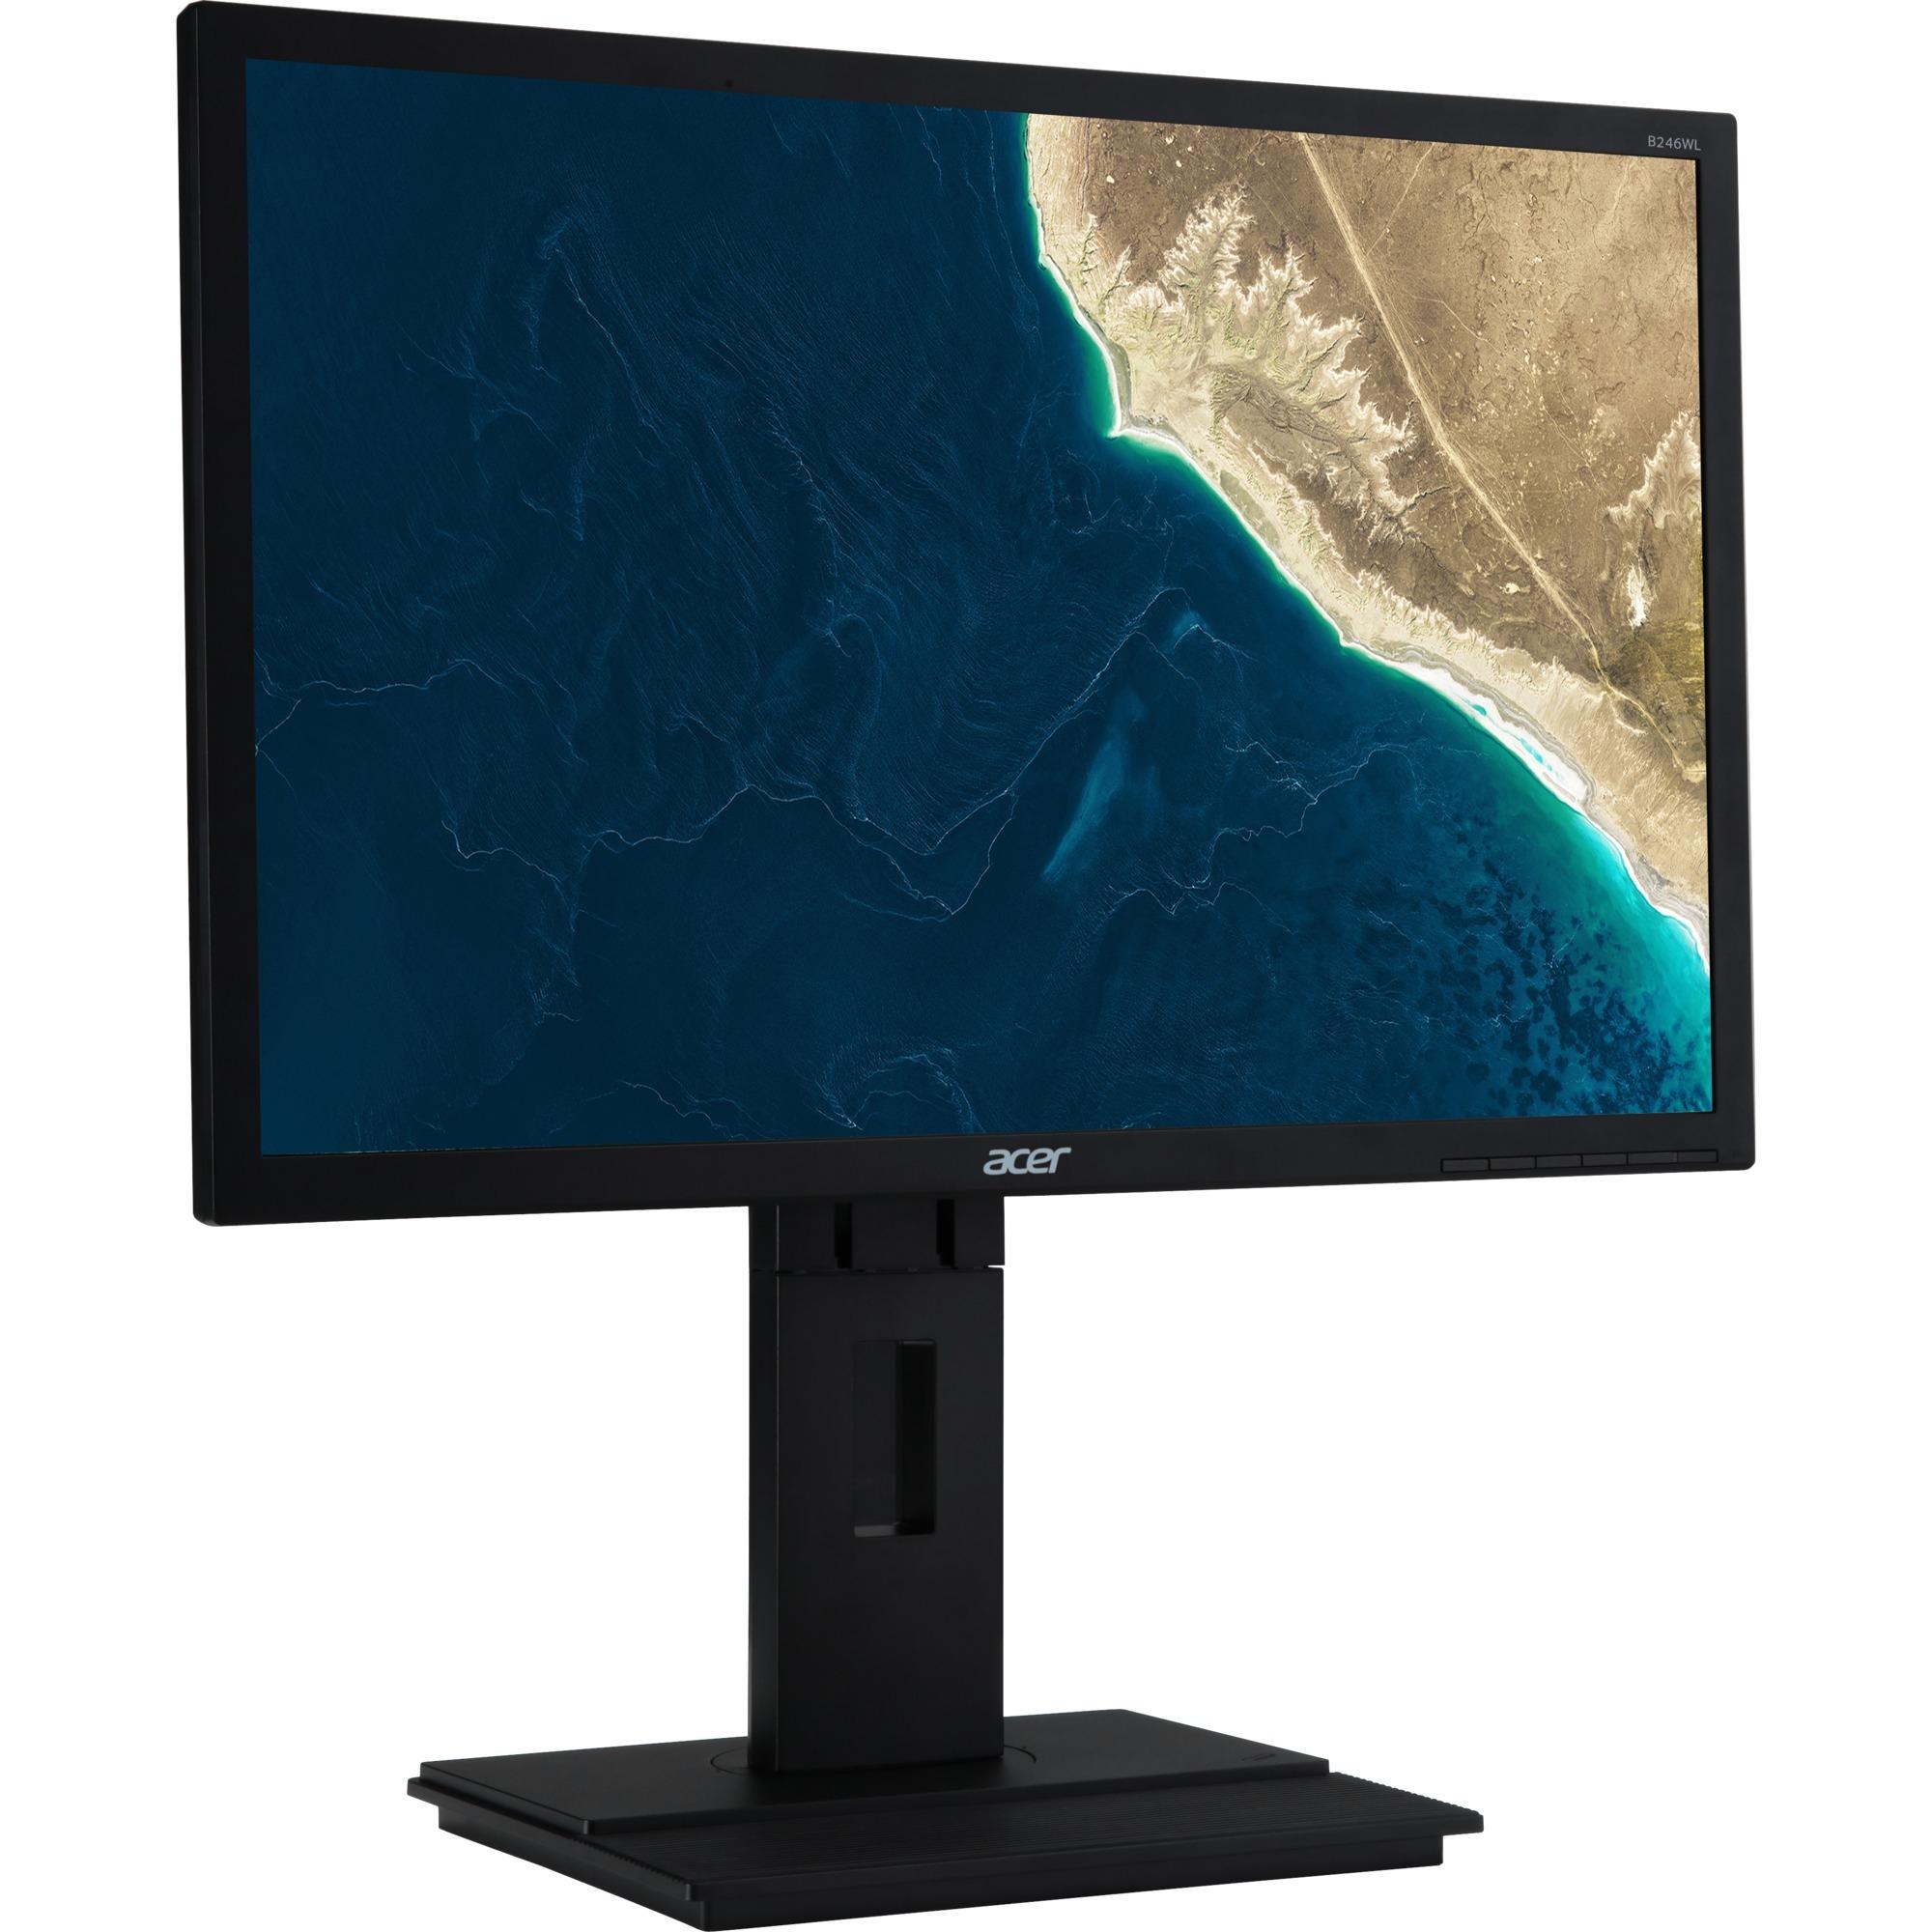 "B6 B246WLA pantalla para PC 61 cm (24"") Full HD LED Plana Negro, Monitor LED"